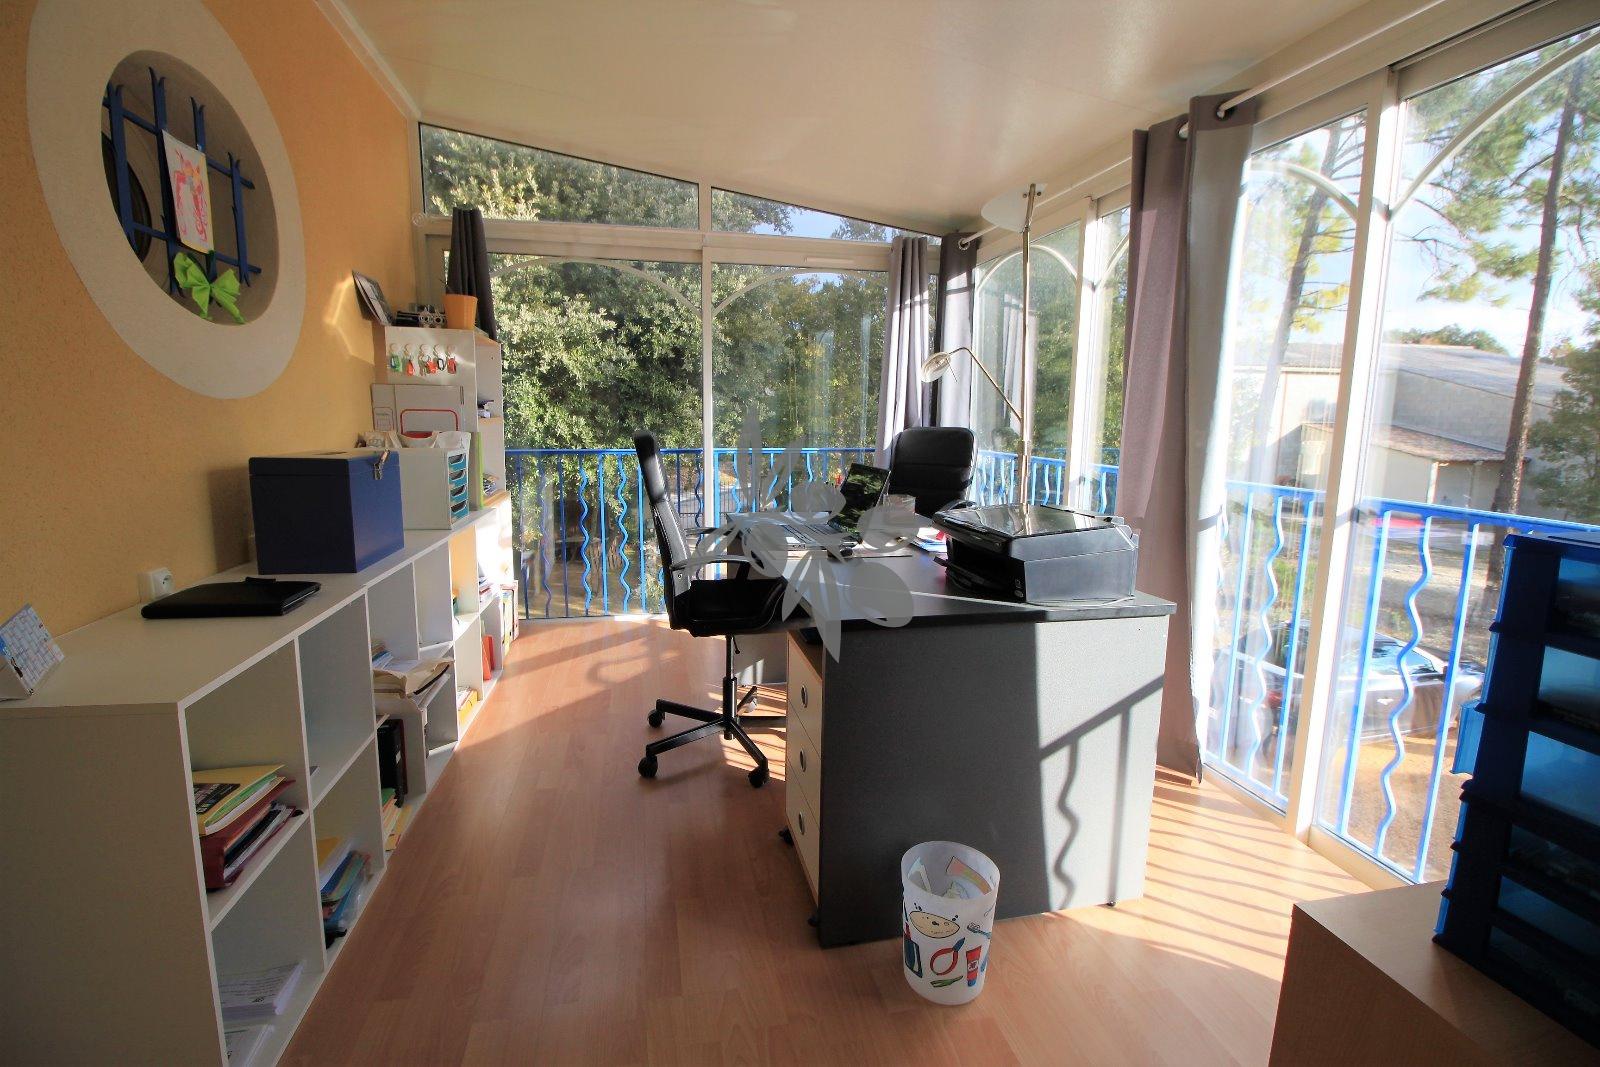 Bureau vitré